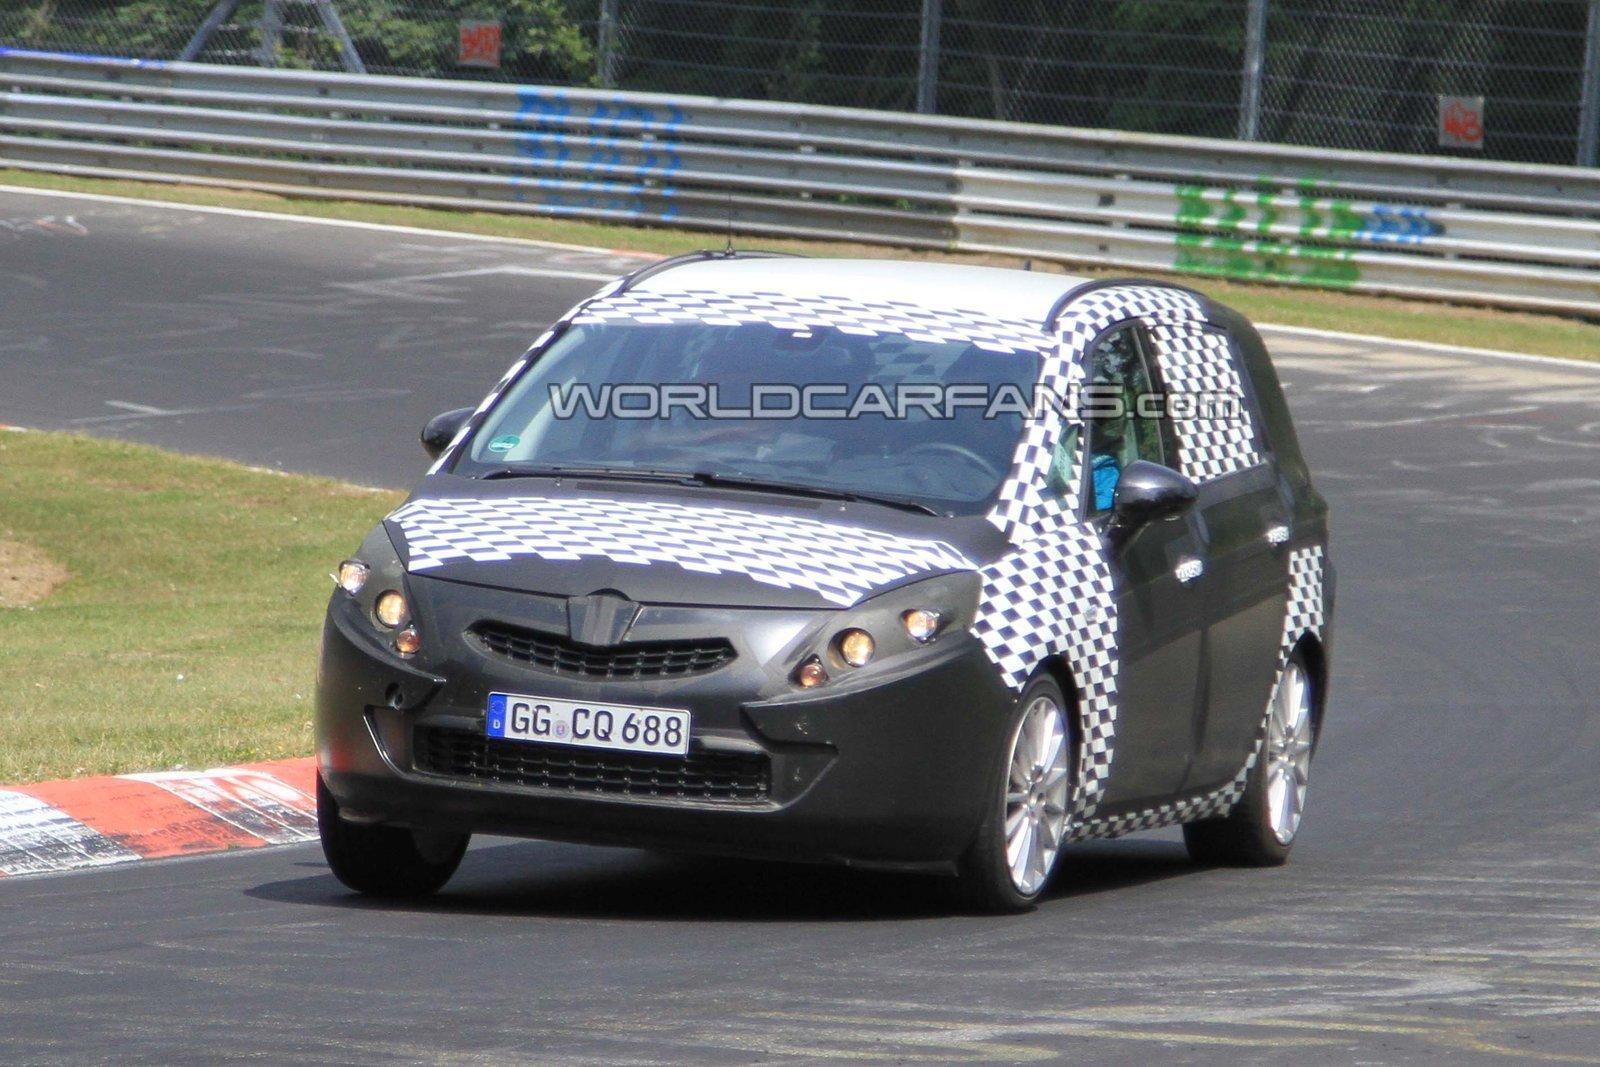 Opel Zafira 2012 - Foto spia 06-07-2012